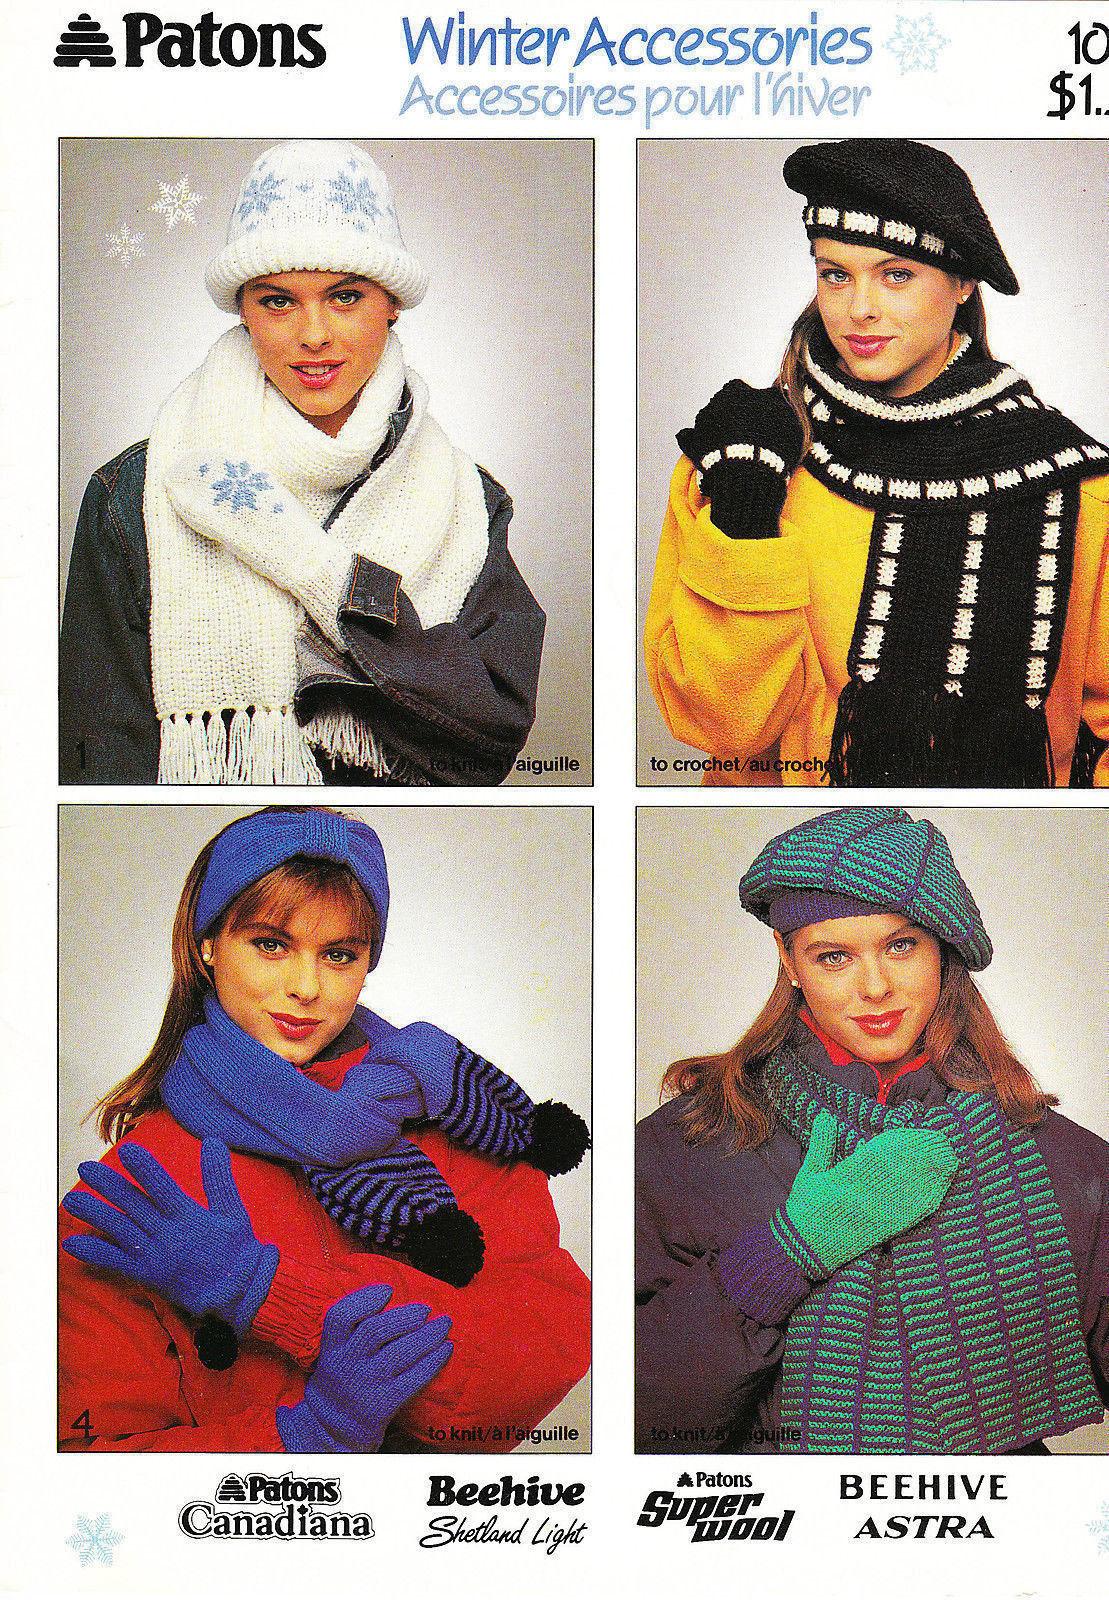 Patons Knitting Pattern: 130 listings